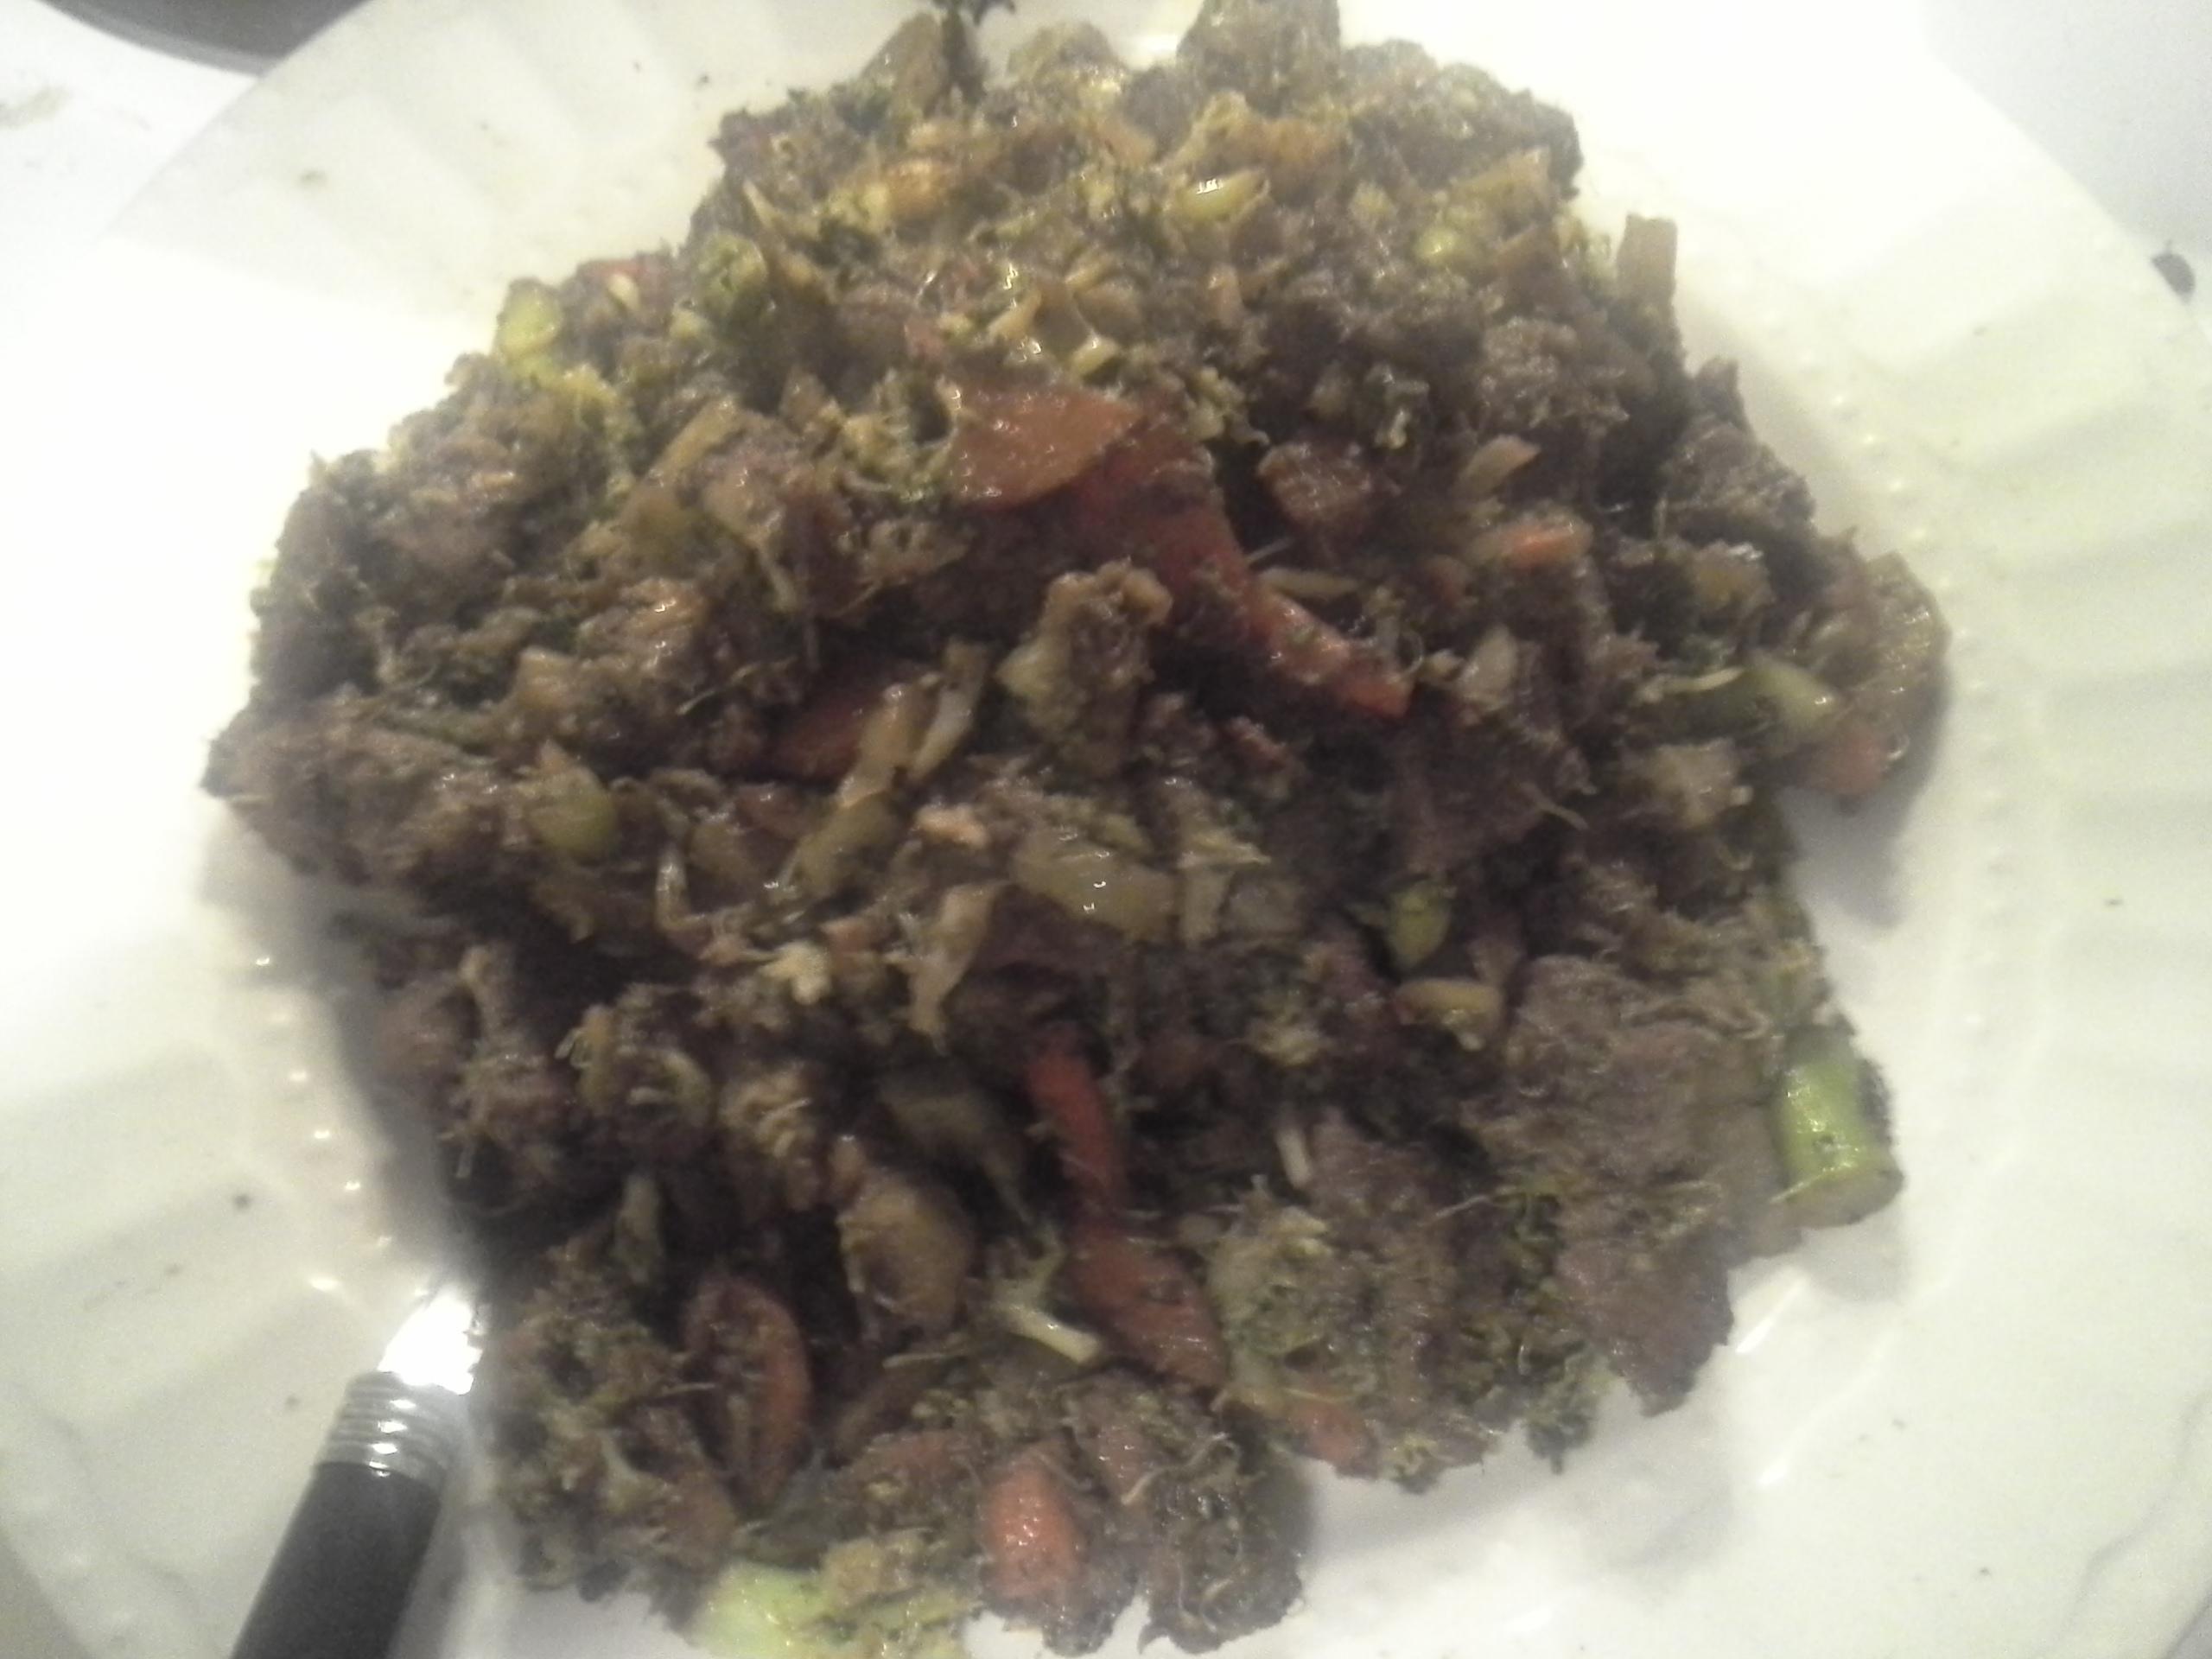 Dinner: 9:45 p.m. | 8 oz. lamb, 1/3 bunch broccoli, 1 carrot, 1/2 sweet onion, 4 cloves garlic, 2 Tbsp. coconut oil, herbs & spices